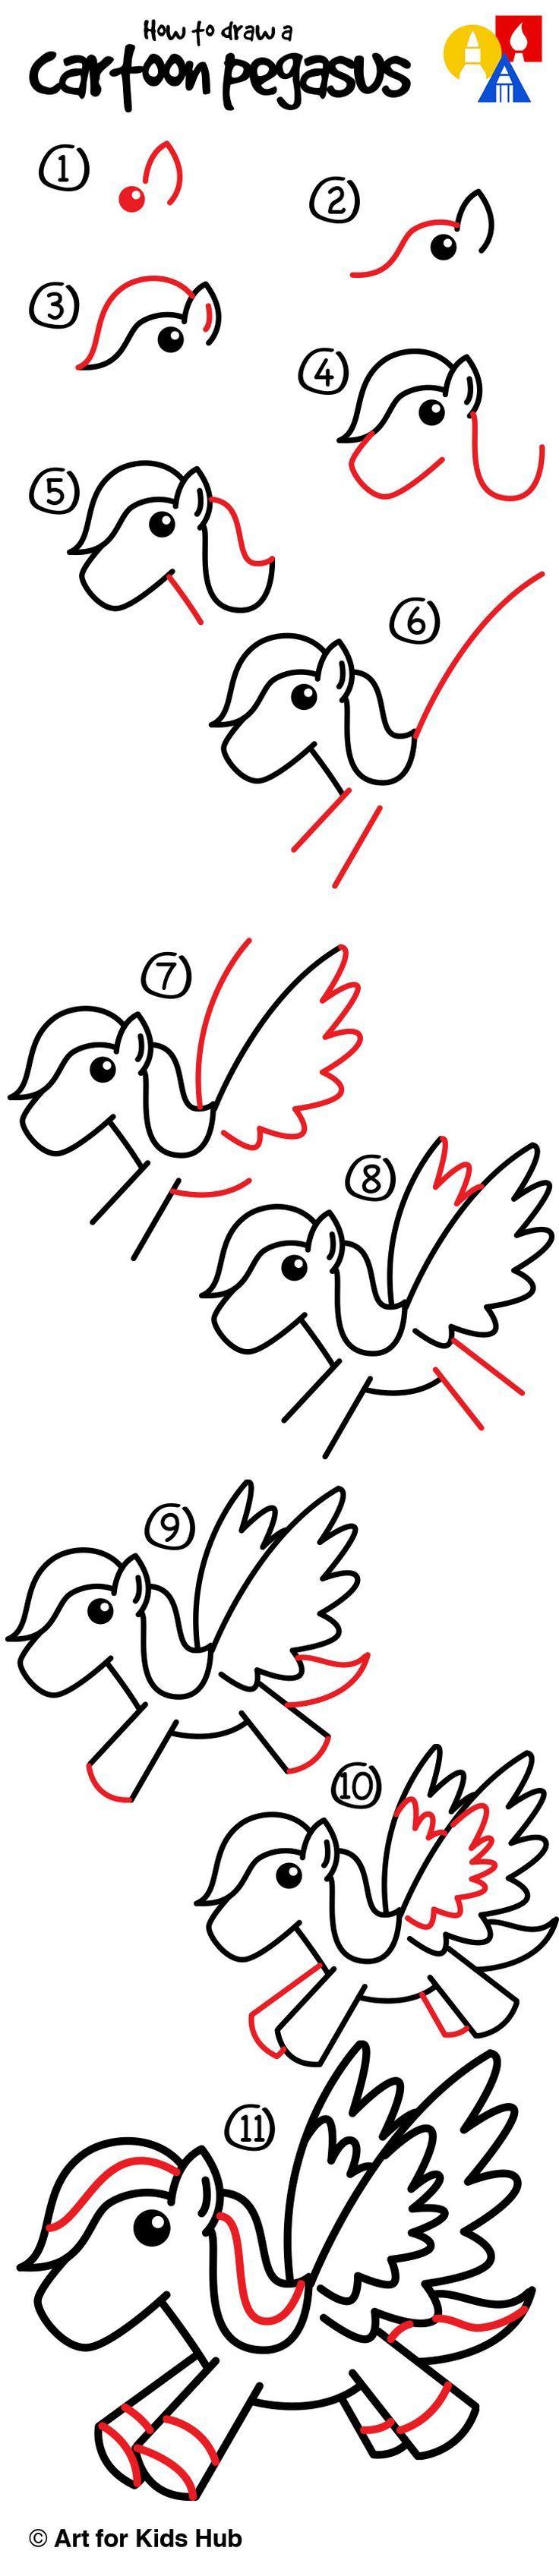 How to draw a cartoon pegasus!